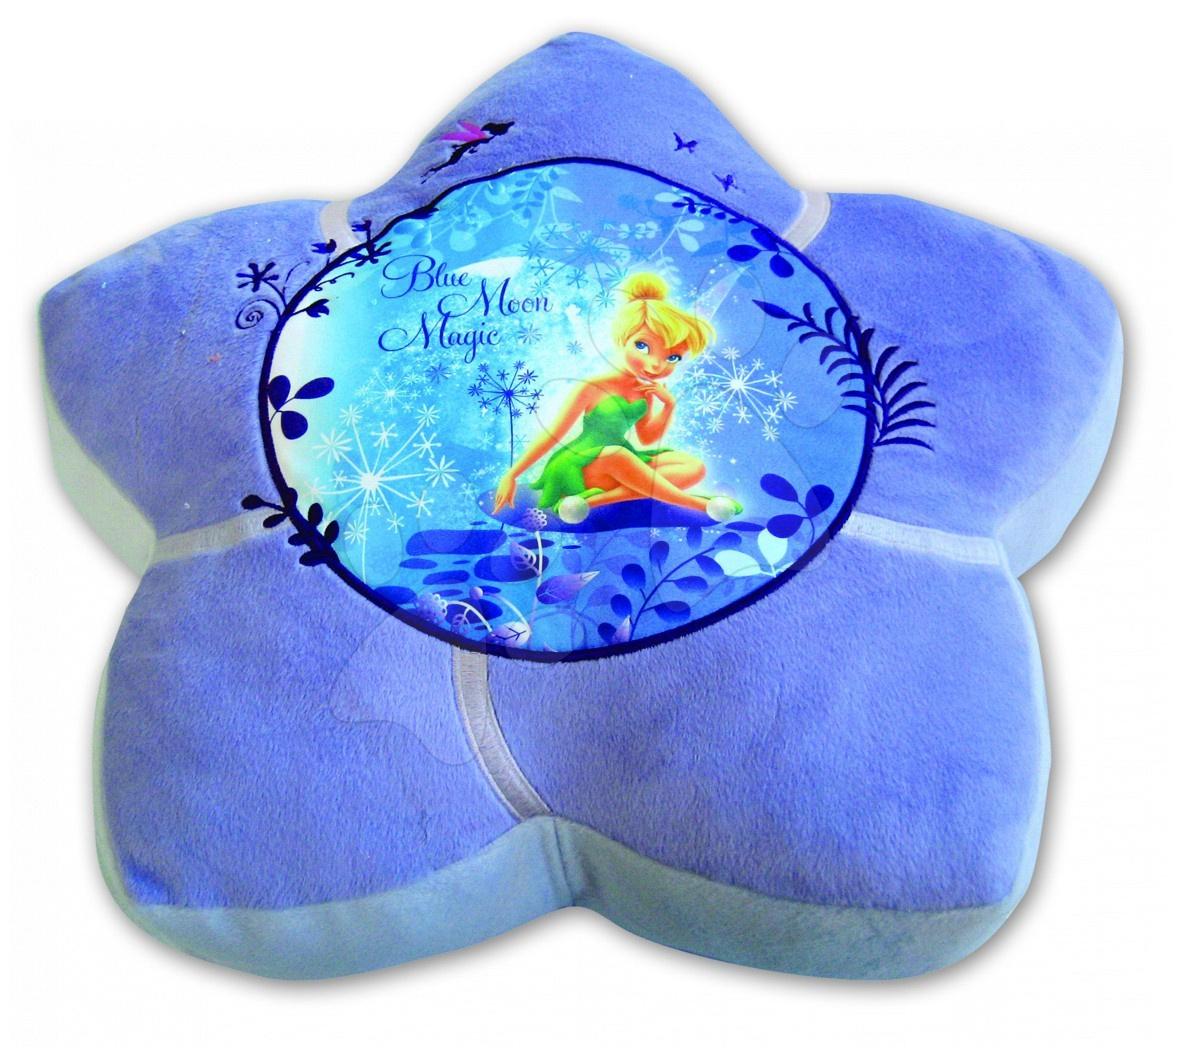 Sedátko Fairies Ilanit modré 50 cm